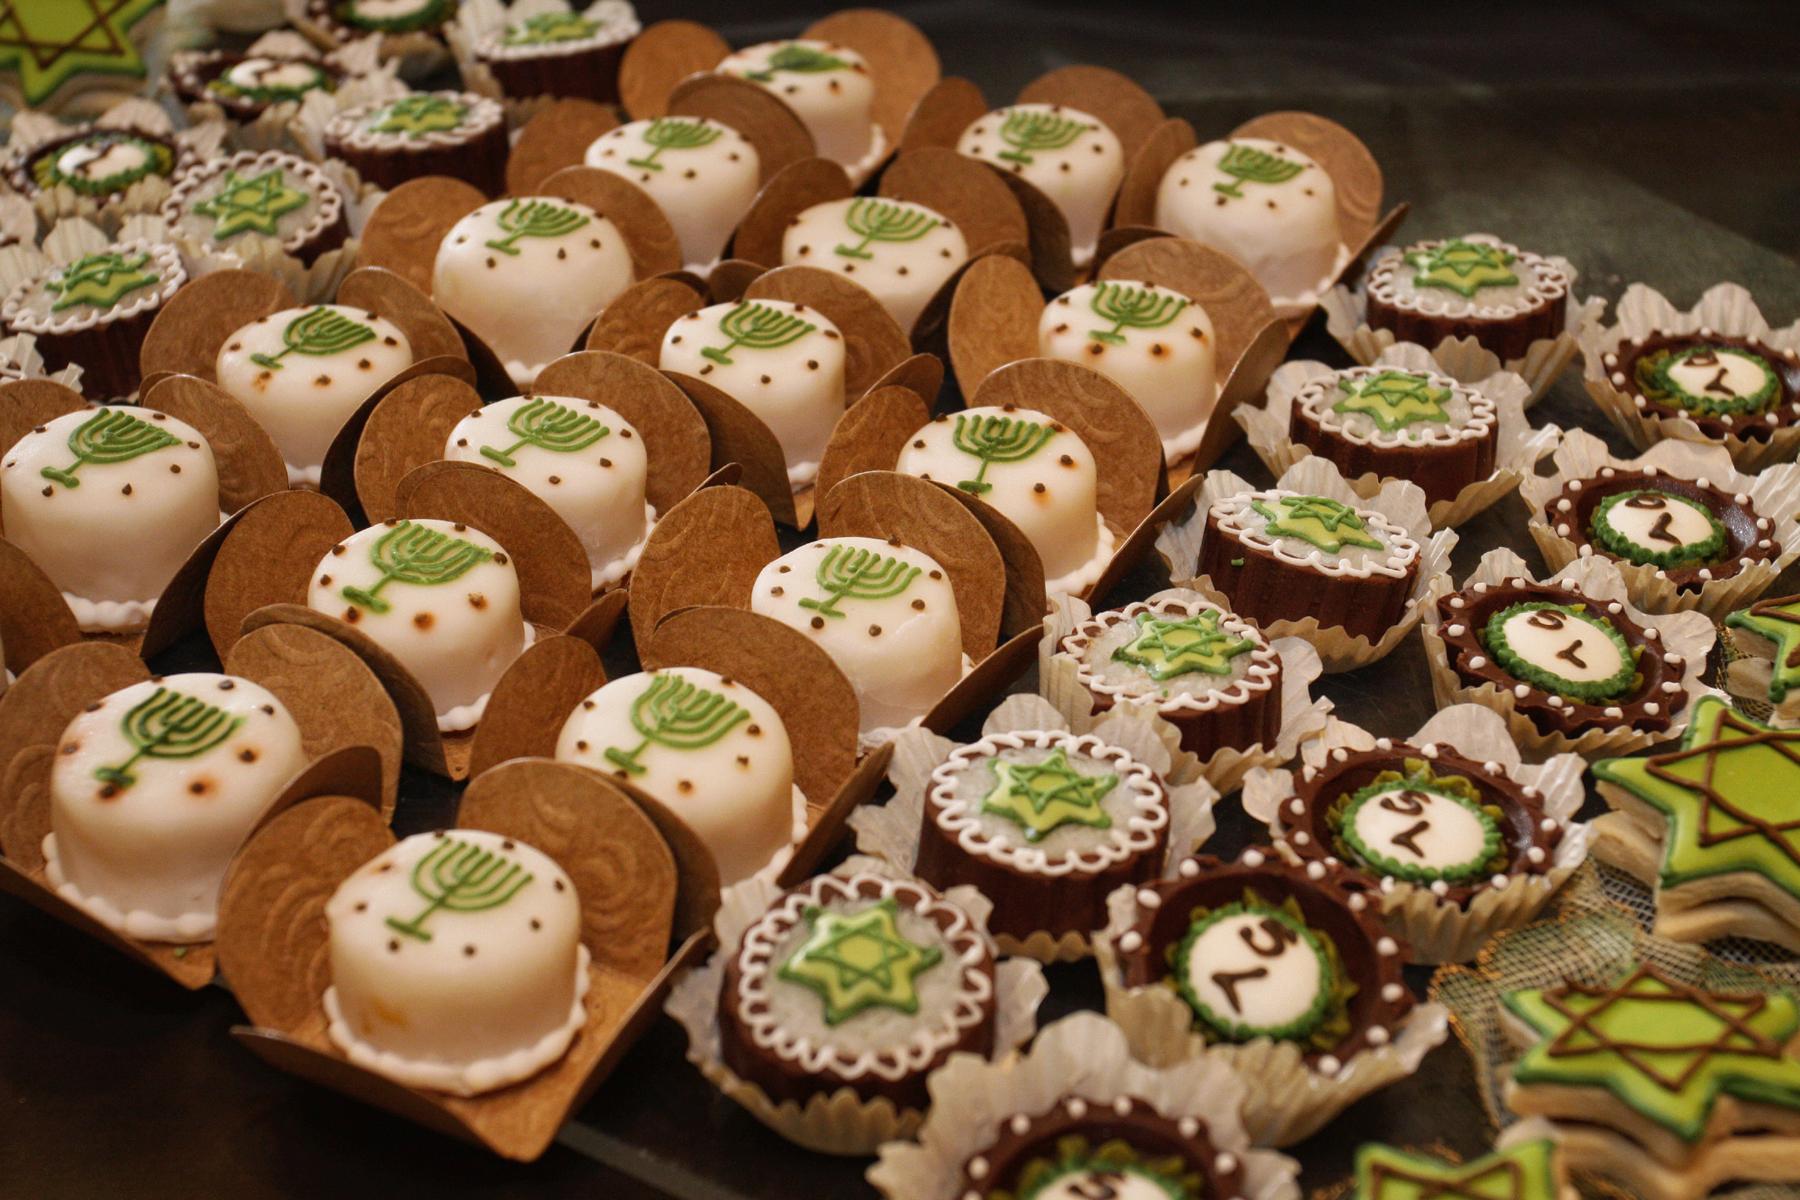 39-central-florida-bar-bat-mitzvah-sweets-kosher-event-photographer.JPG